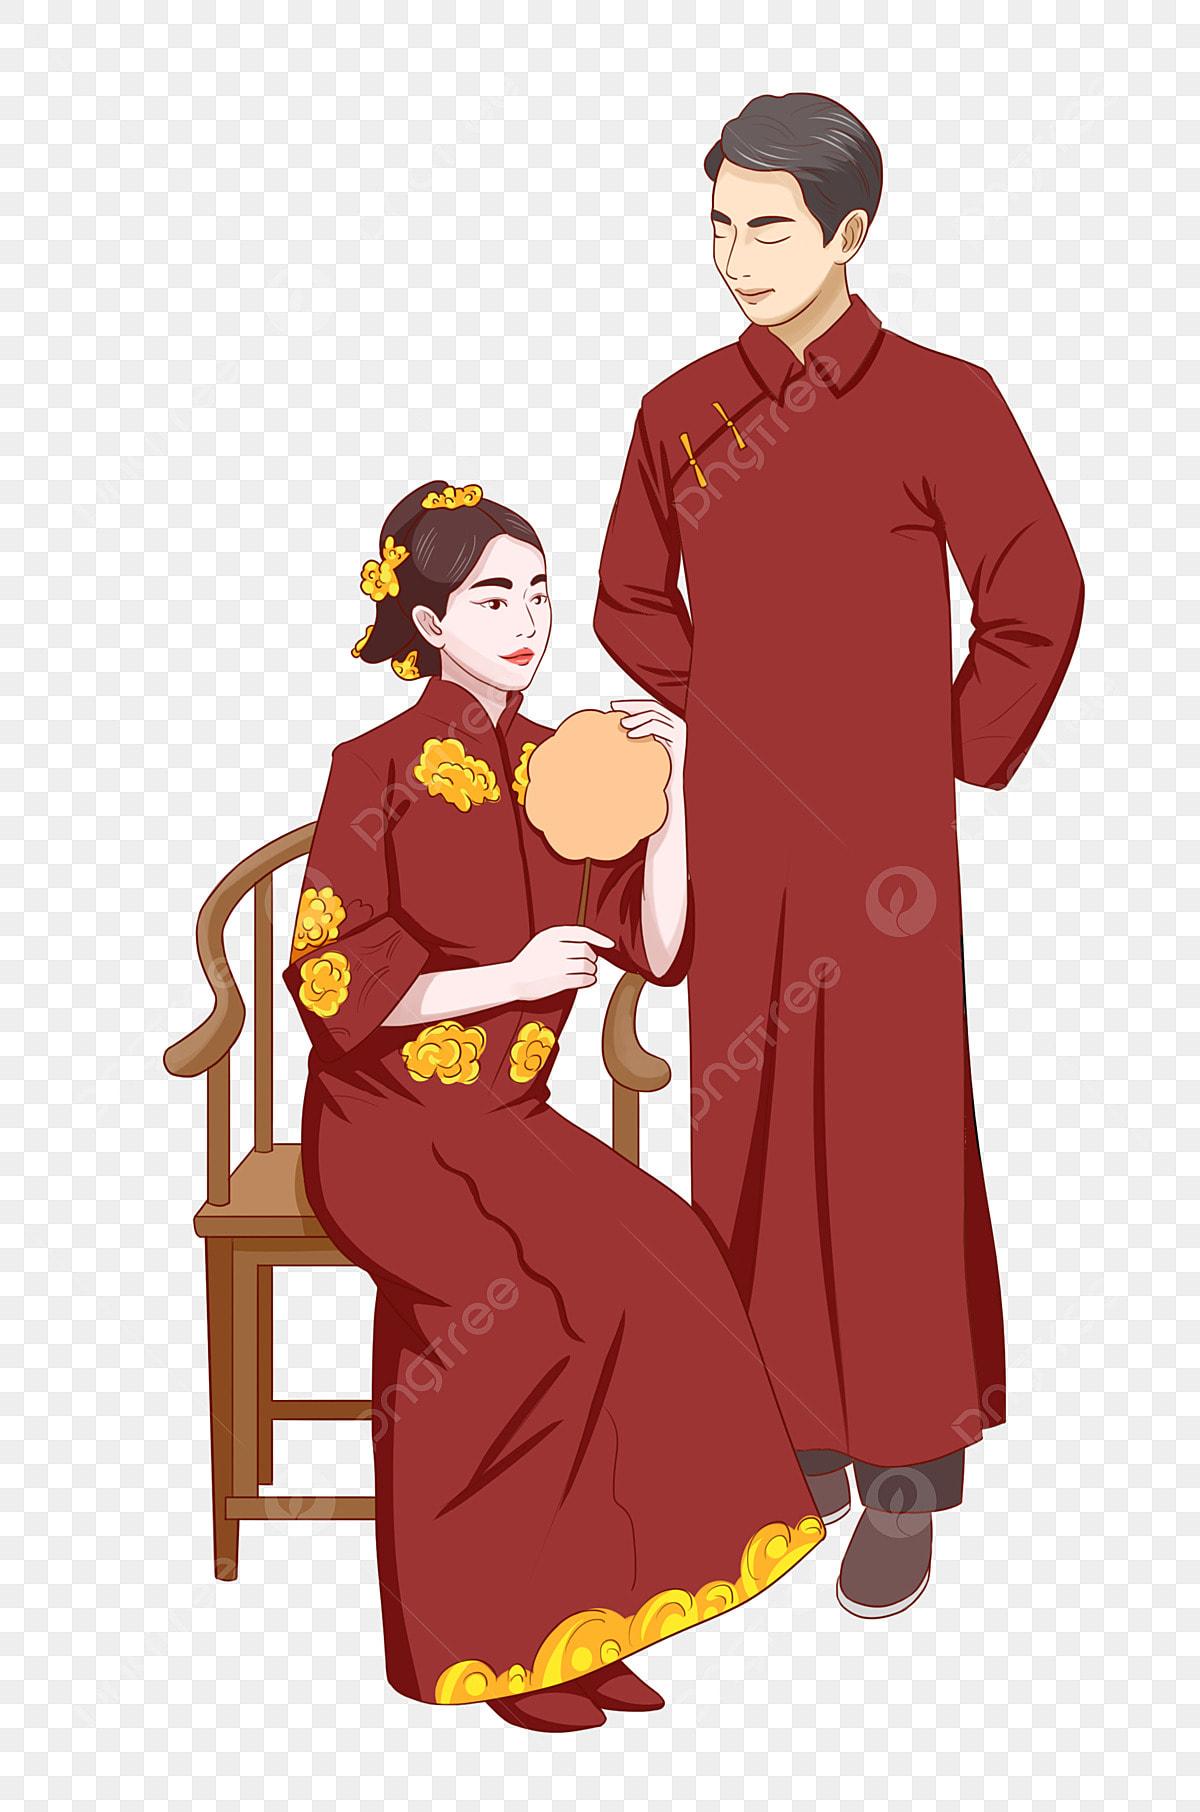 Tangan Ditarik Tradisional Pakaian Pengantin Lelaki Dan